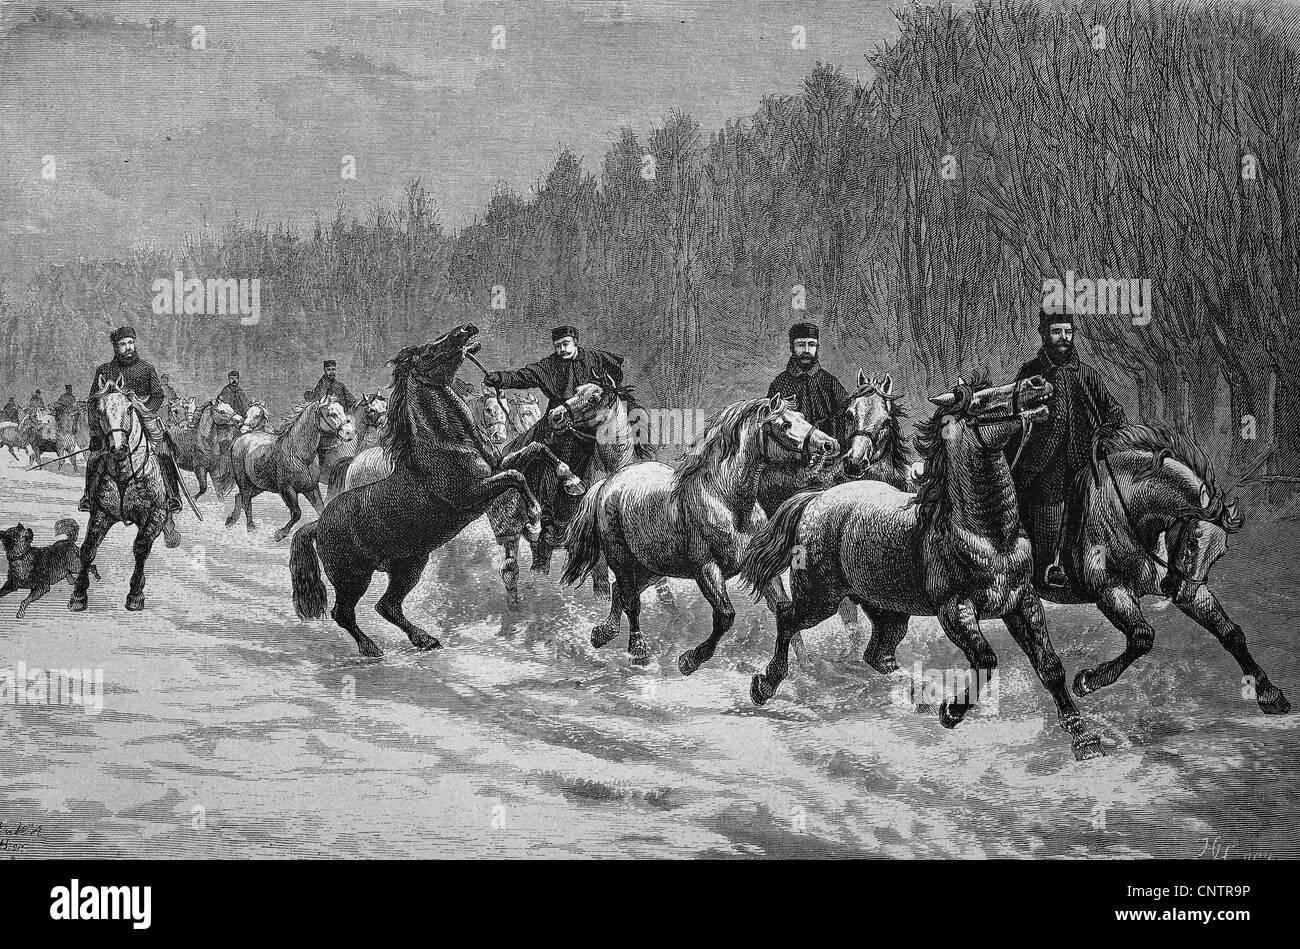 Winter promenade of North American artillery horses, historical woodcut, circa 1870 - Stock Image